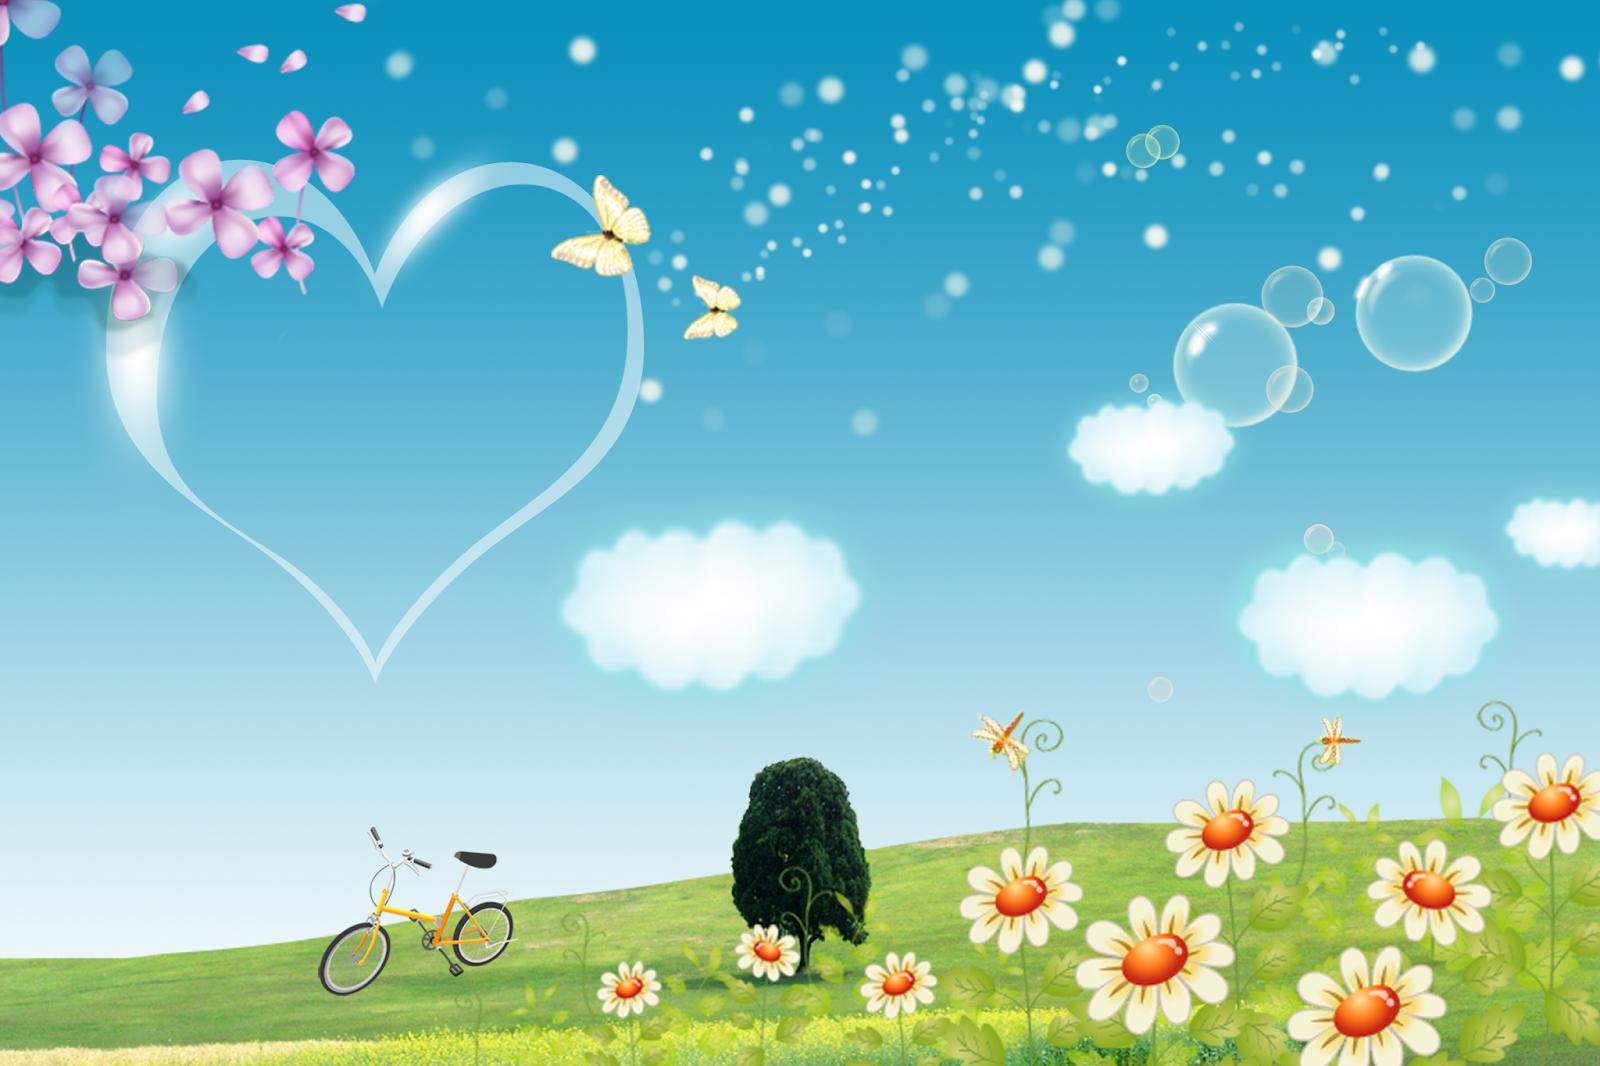 Fondos infantiles para decorar caritas vectores gratis - Fotografias para decorar ...